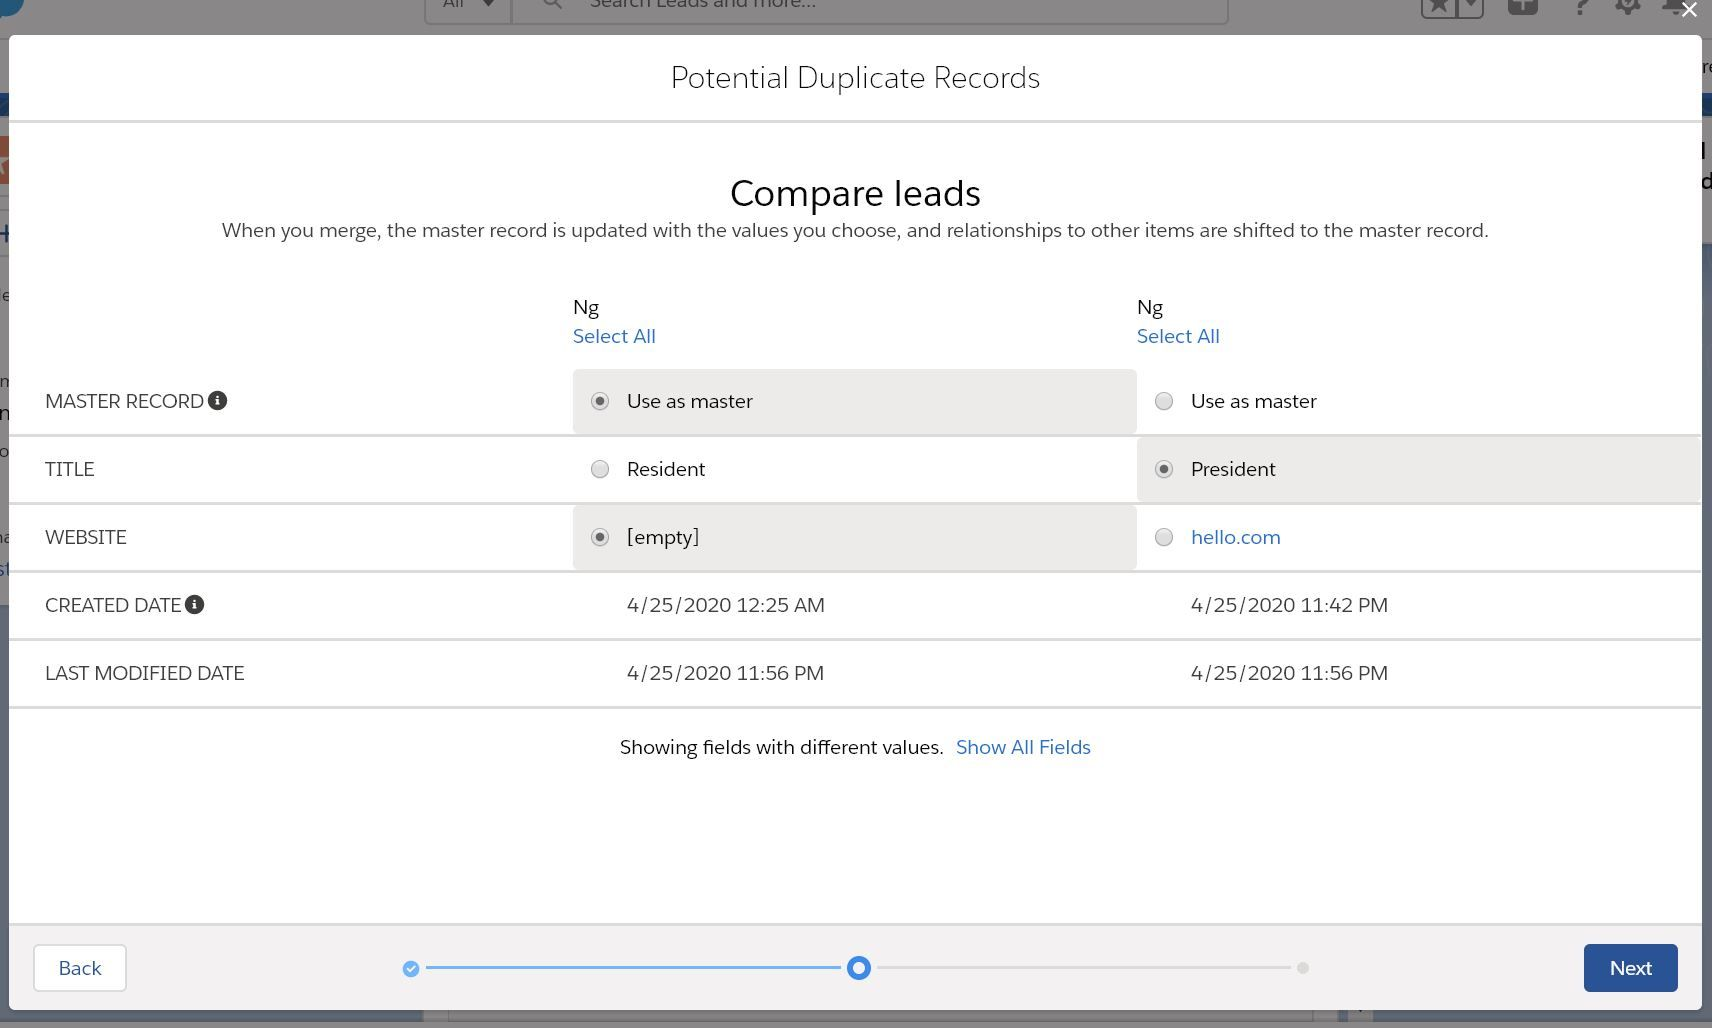 compare-potential-duplicates